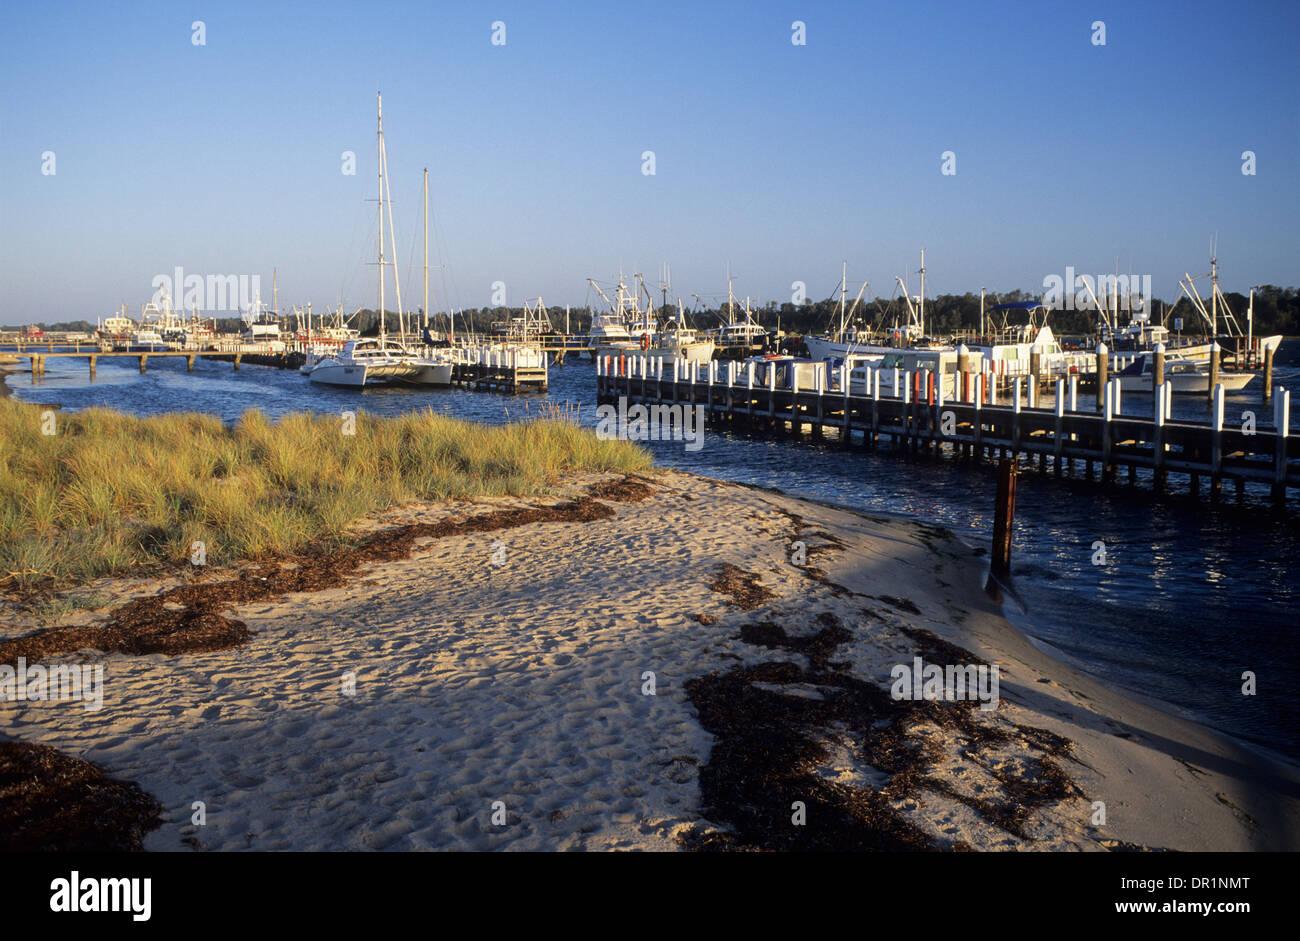 Australia, Victoria, Lakes Entrance, the Marina and fishing fleet